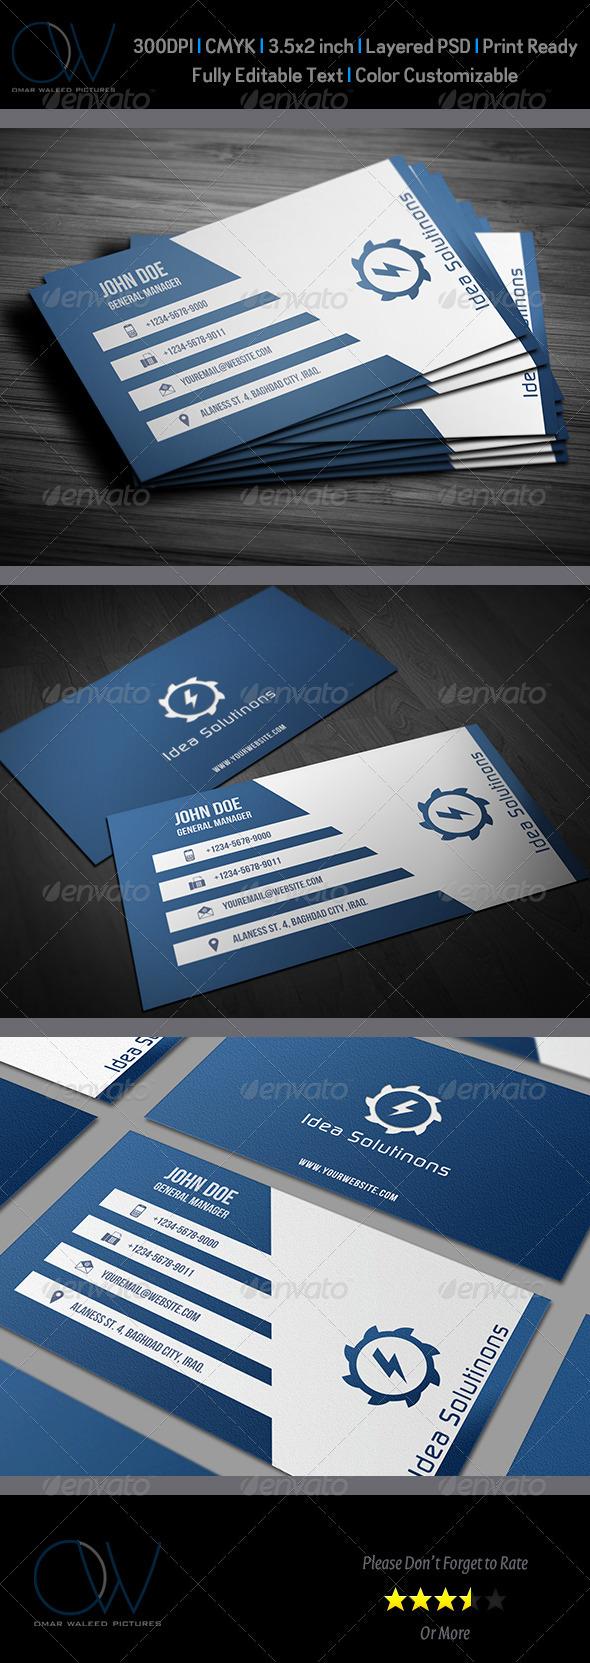 GraphicRiver Corporate Business Card Vol.10 3540897